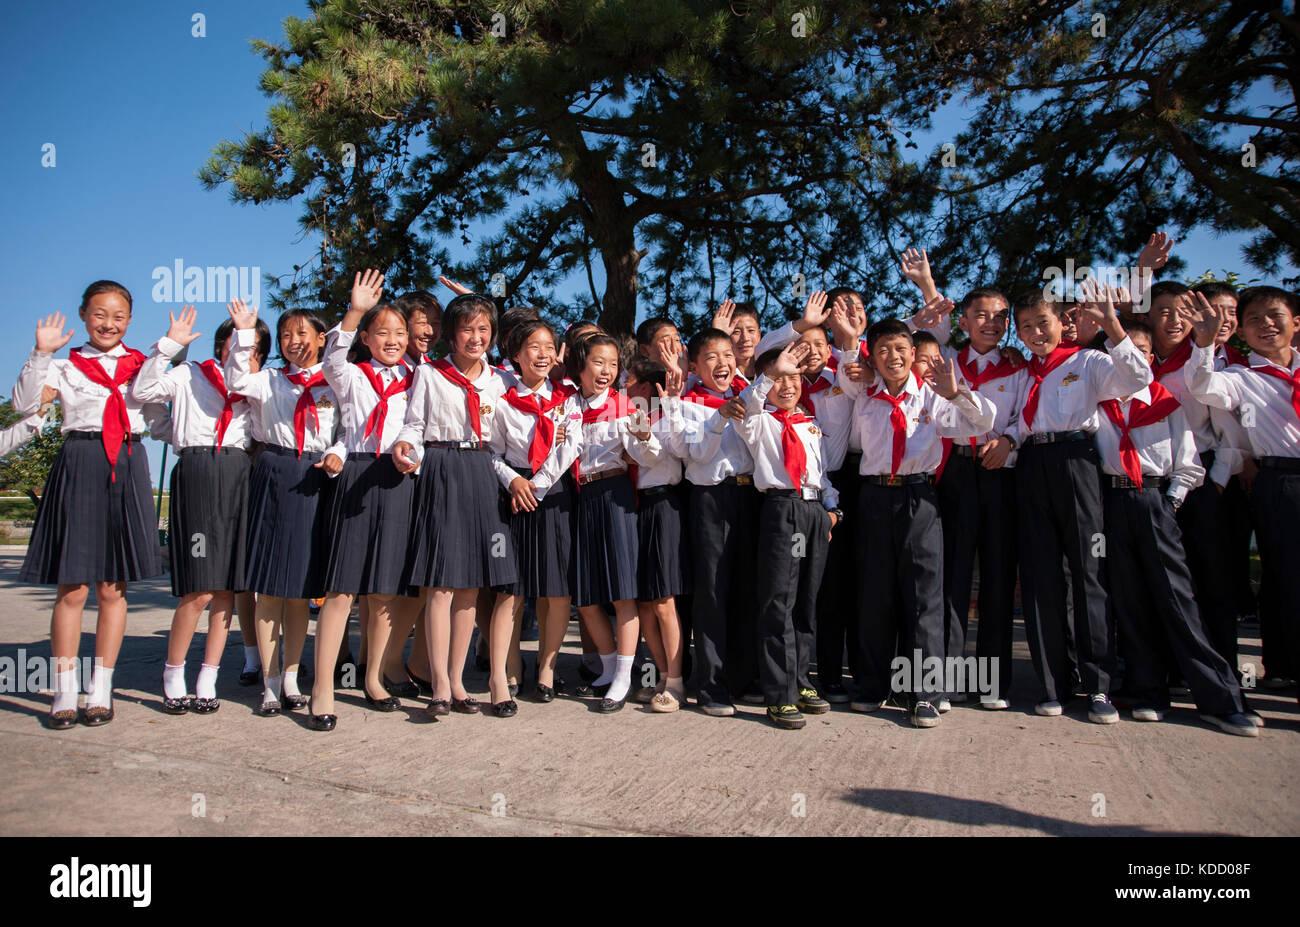 Enfants pionniers au Songdowon International Children's Camp le 11 octobre 2012. Pioneers At Songdowon International Stock Photo